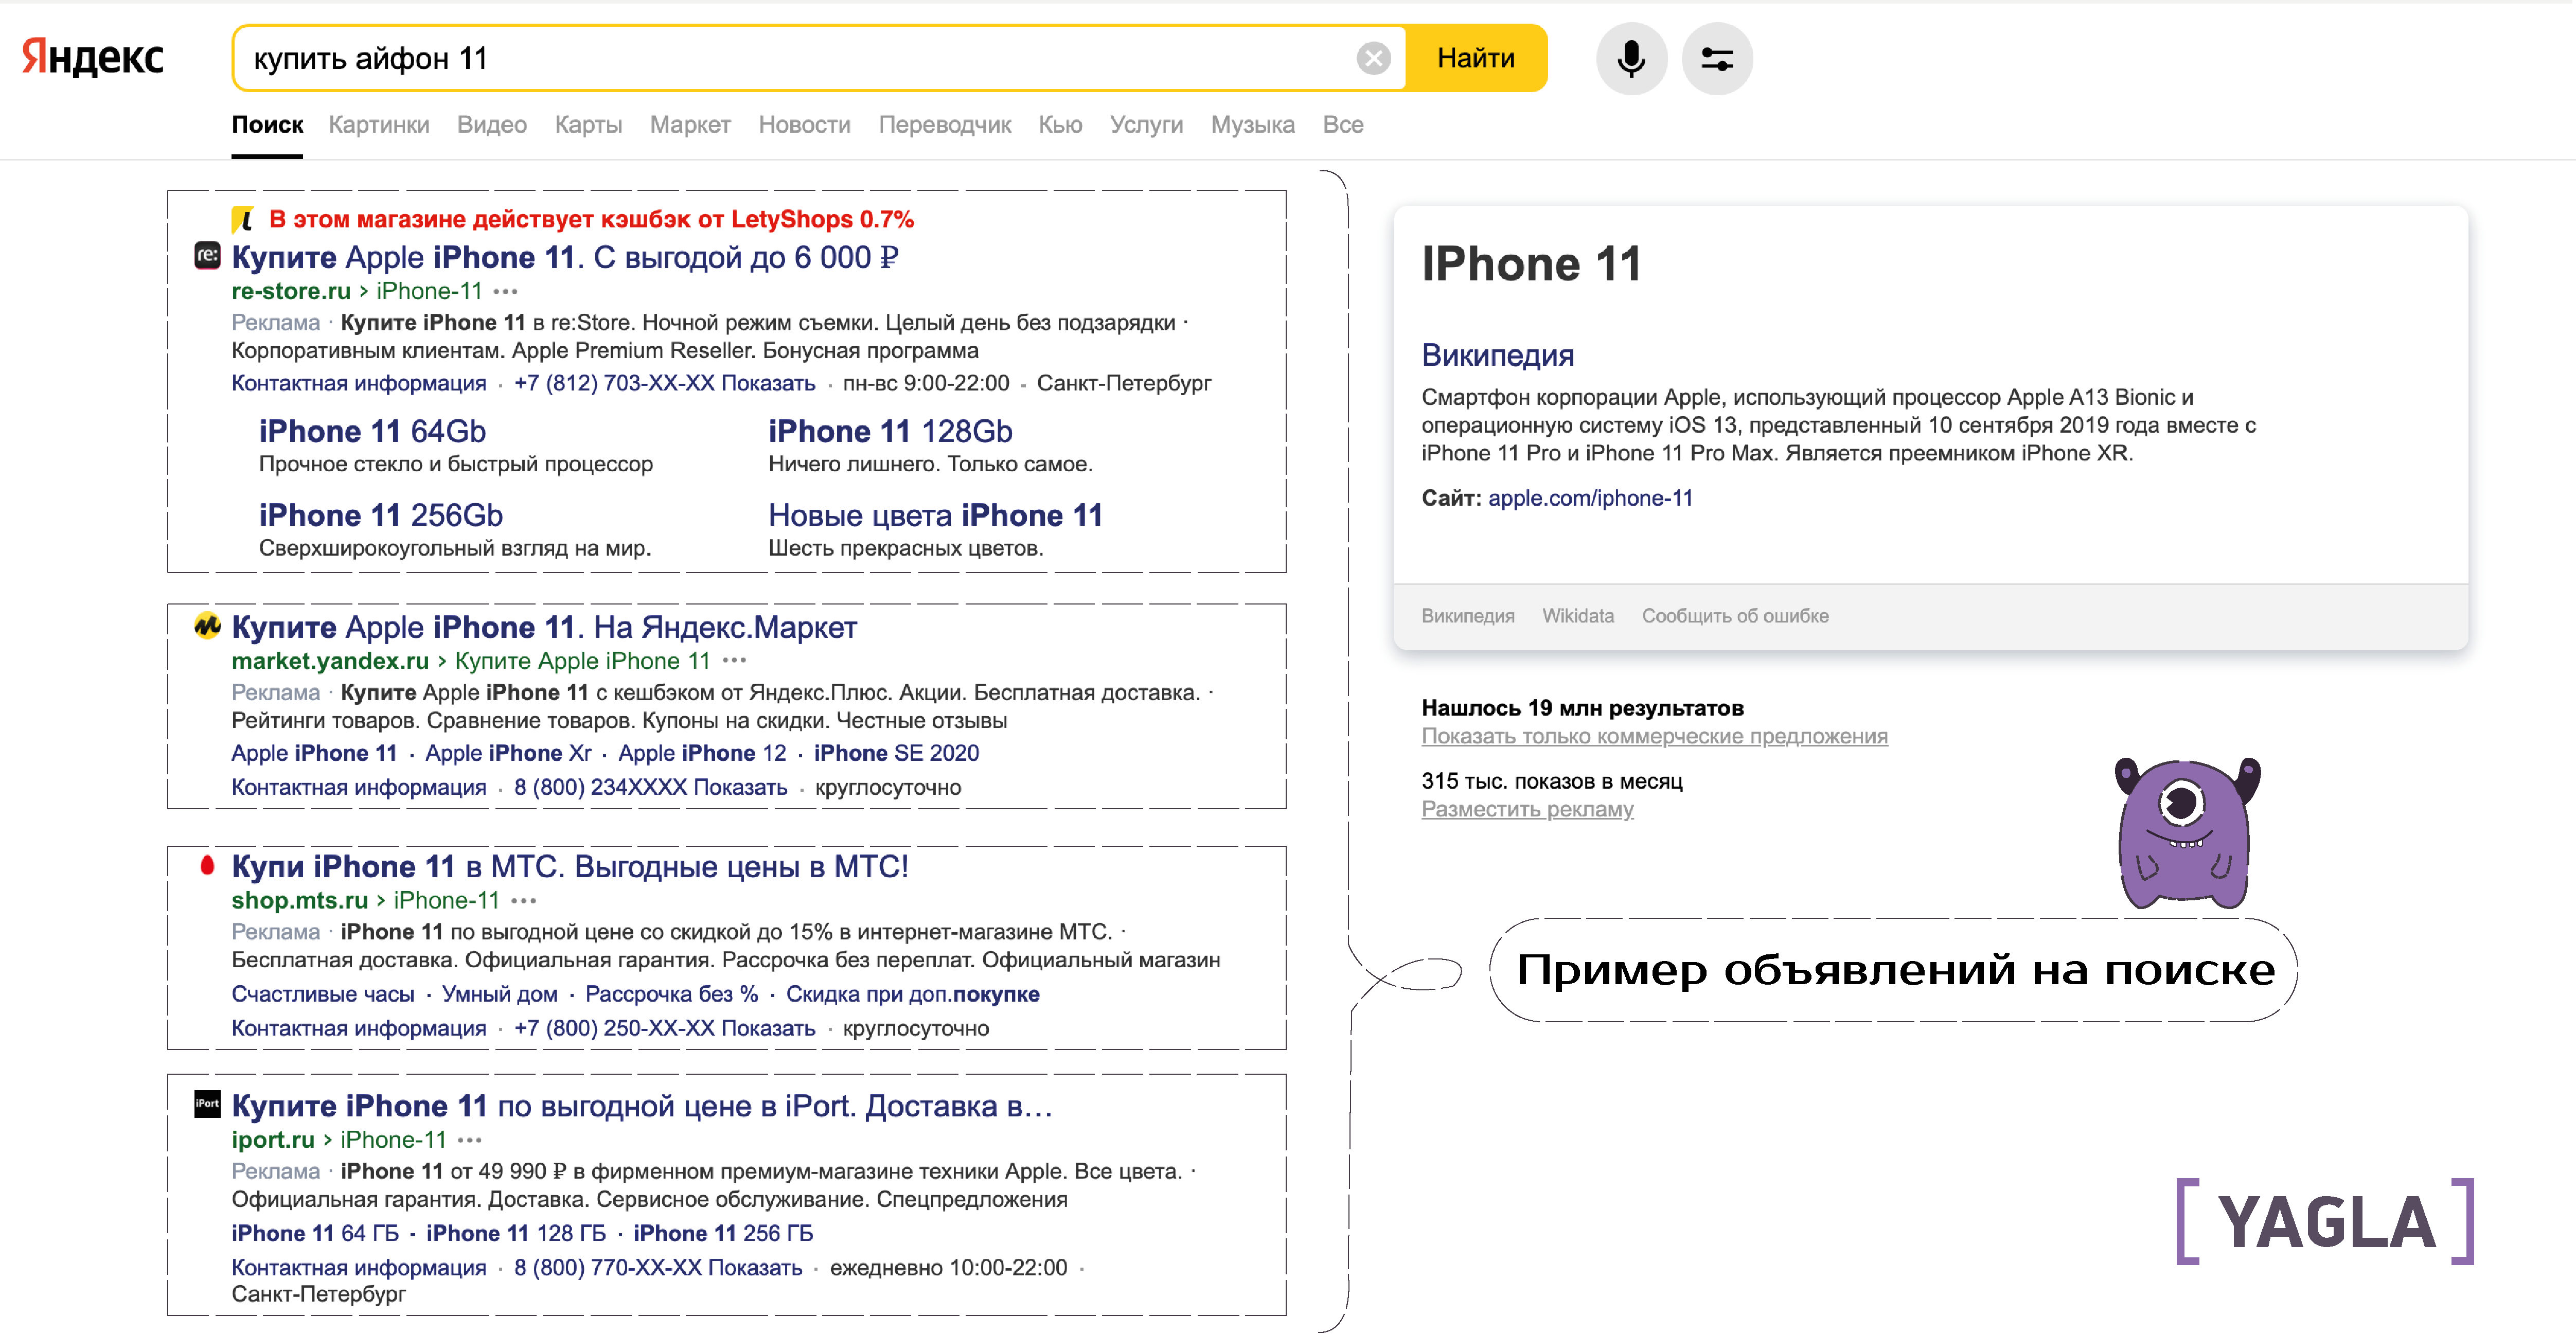 Объявления на поиске Яндекс.Директ пример